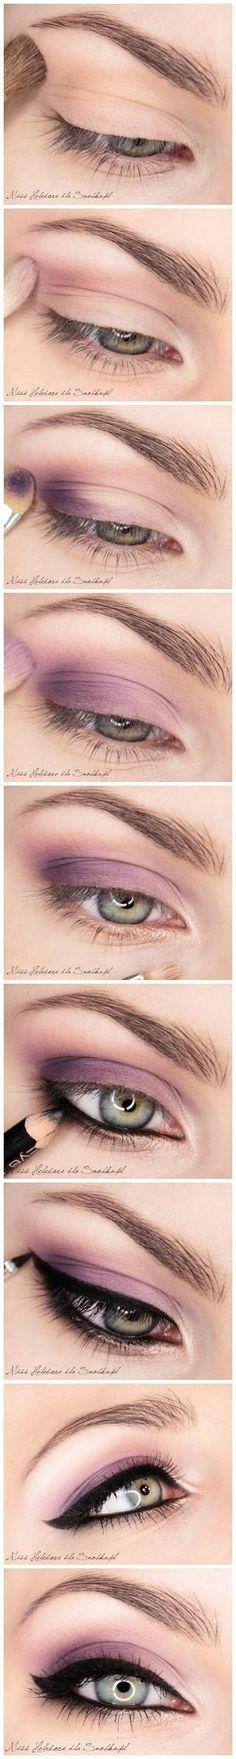 Makeup TIps: Beauty Tips: Eye Makeup: Beautiful eye makeup. Nice and easy to follow steps.